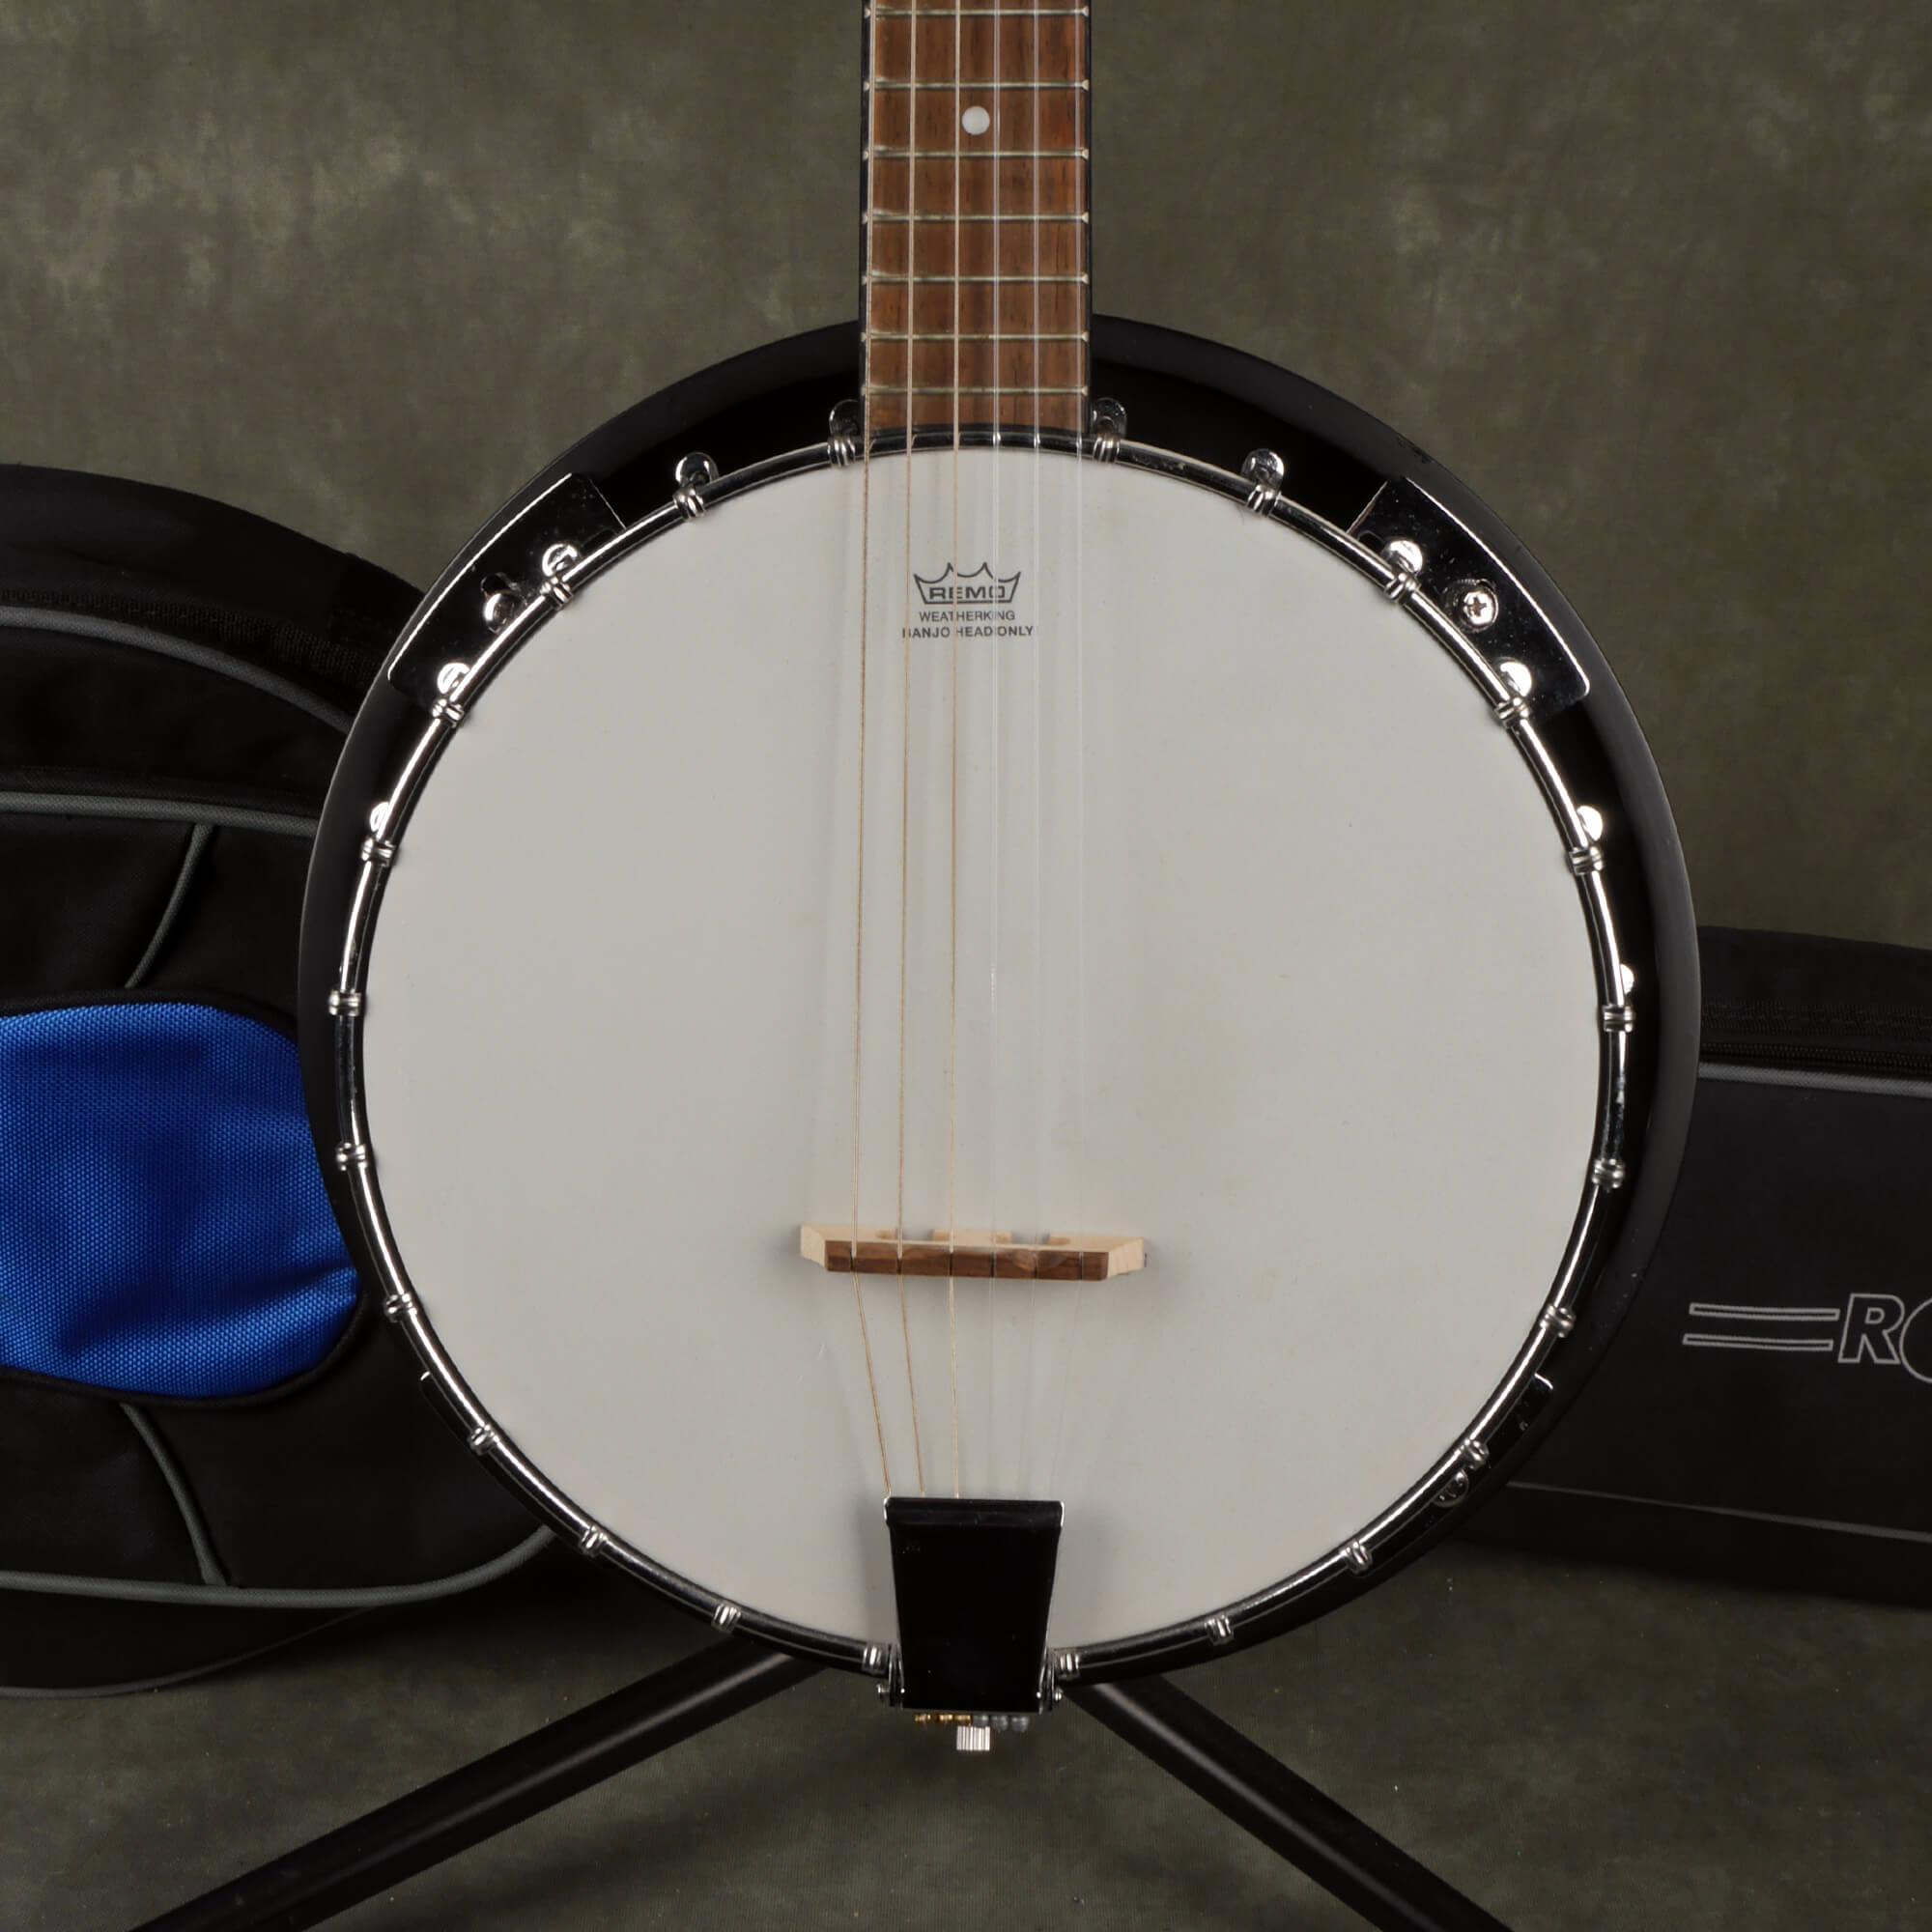 Countryman 6 string Banjo w/Gig Bag - 2nd Hand